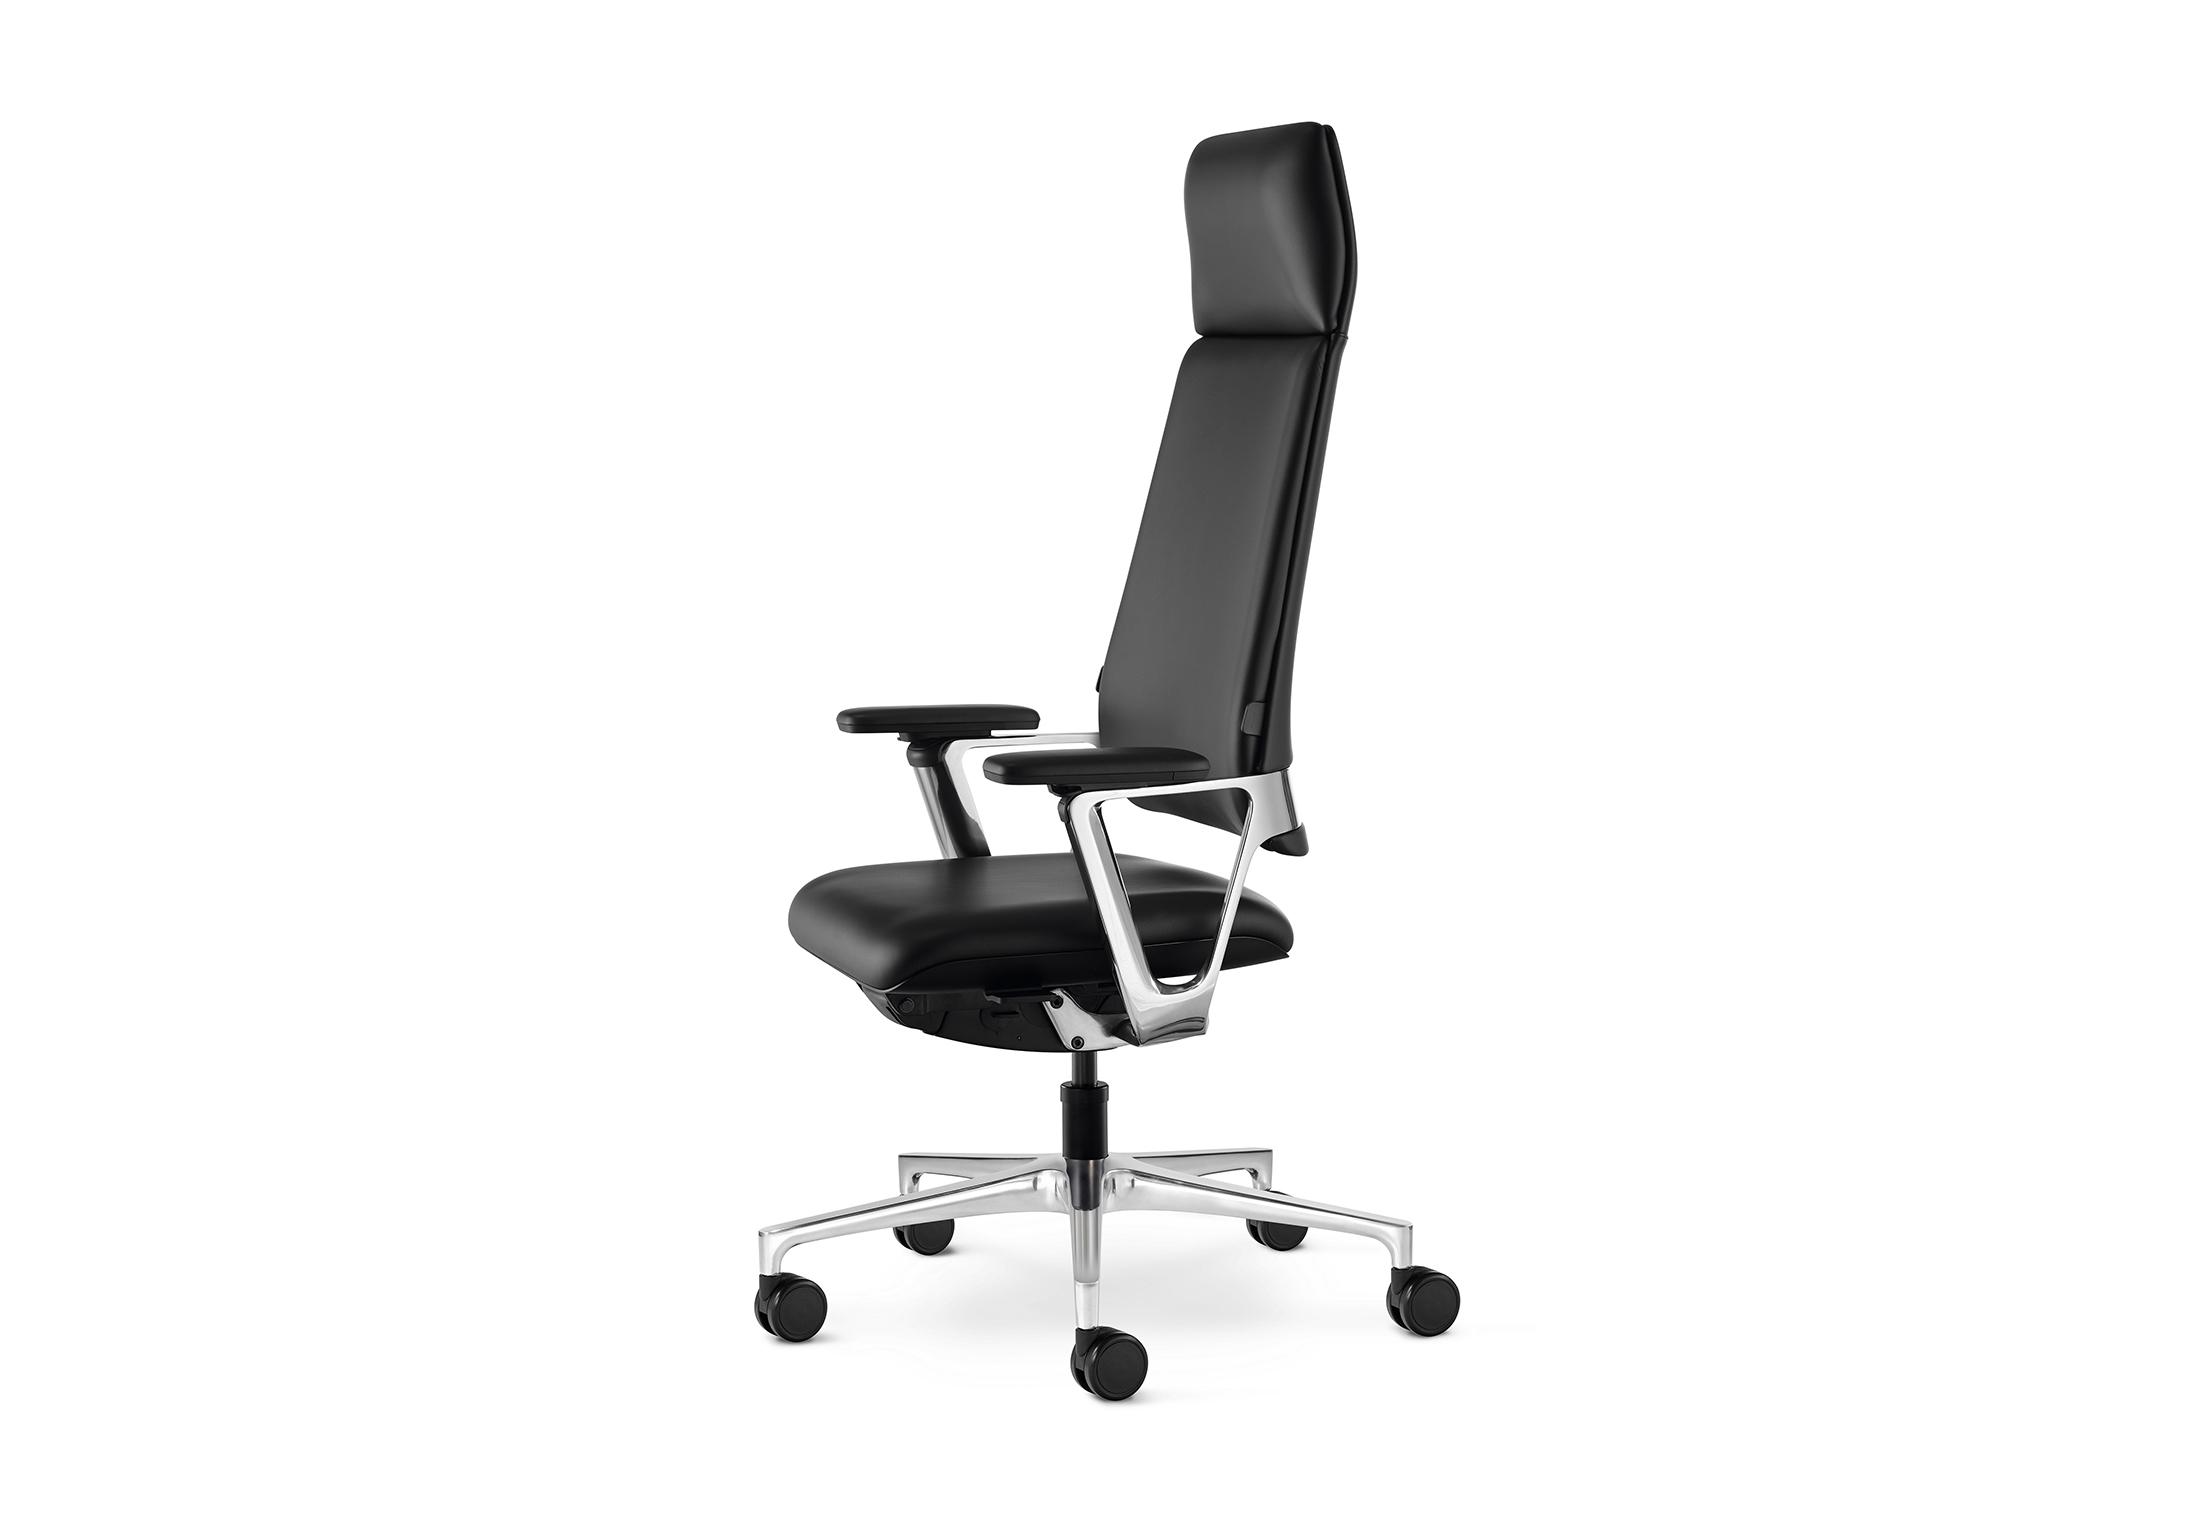 connex2 high back task chair by klöber stylepark